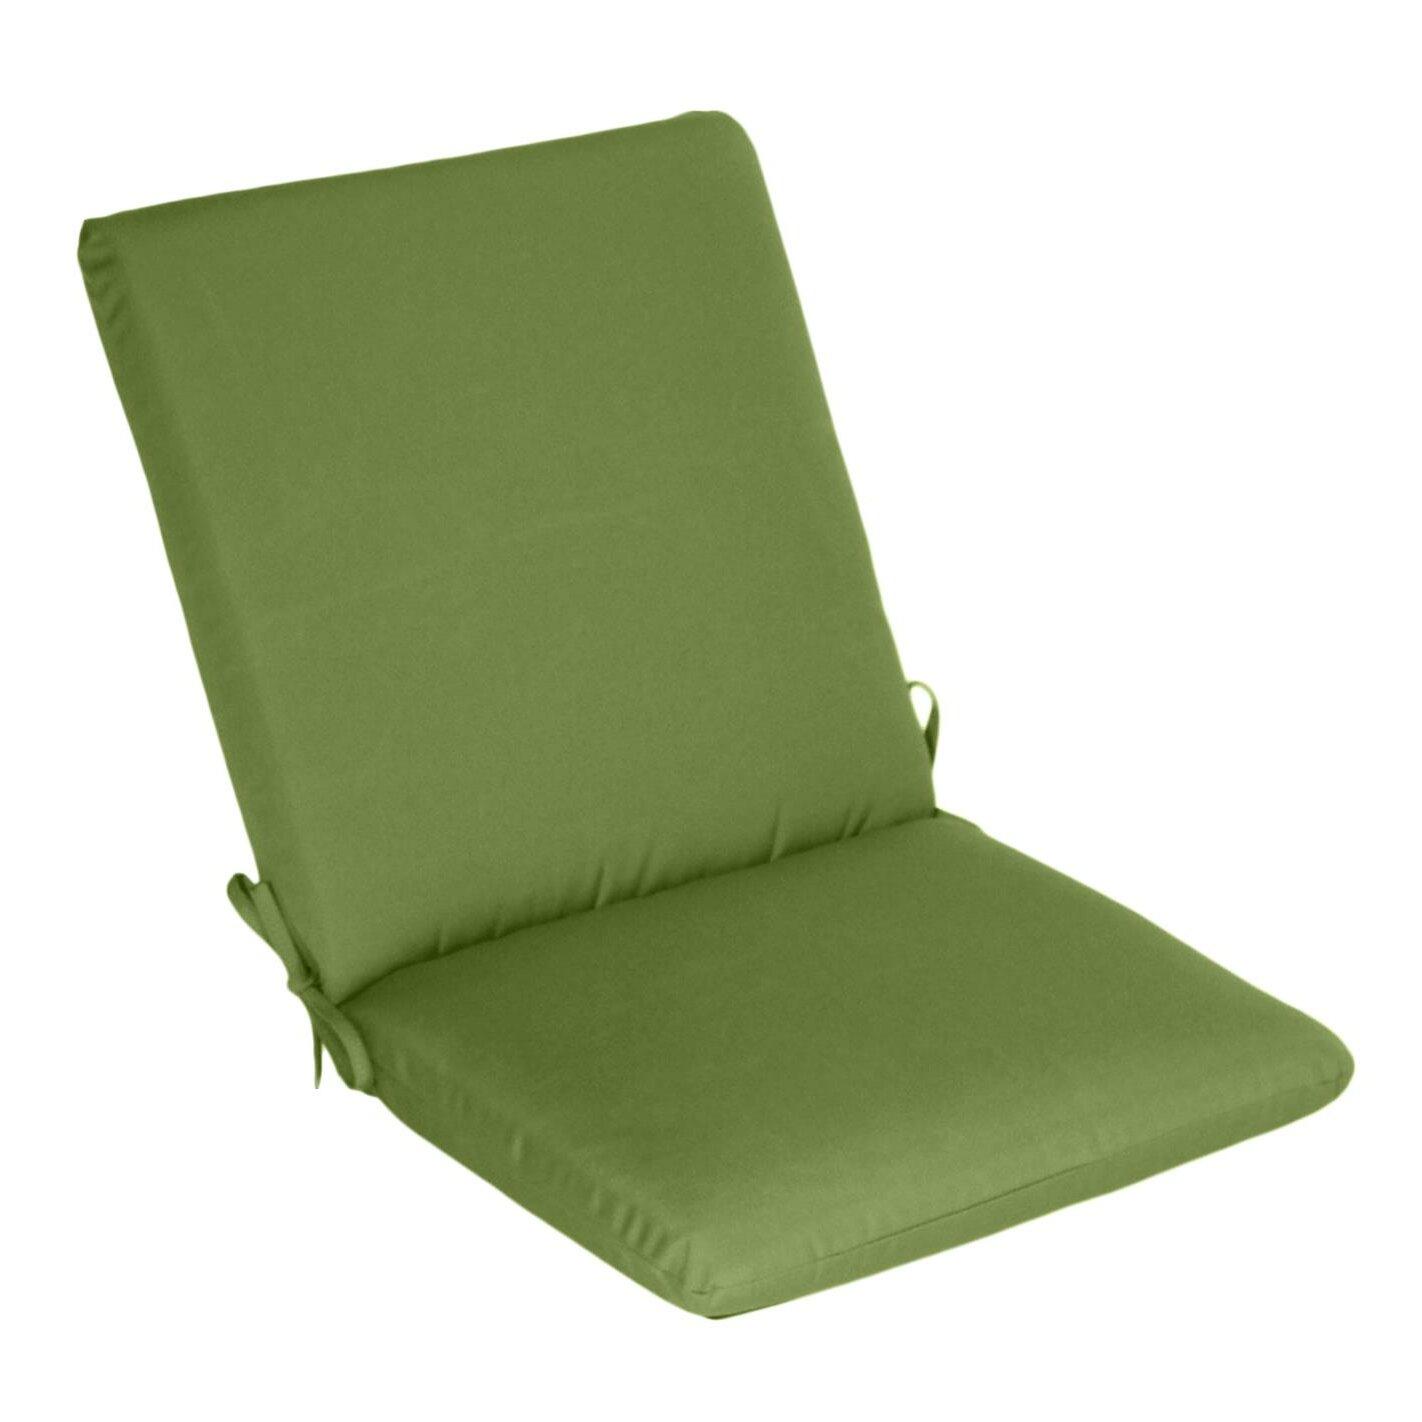 Wildon Home ® Outdoor Sunbrella High Back Cushion | Wayfair